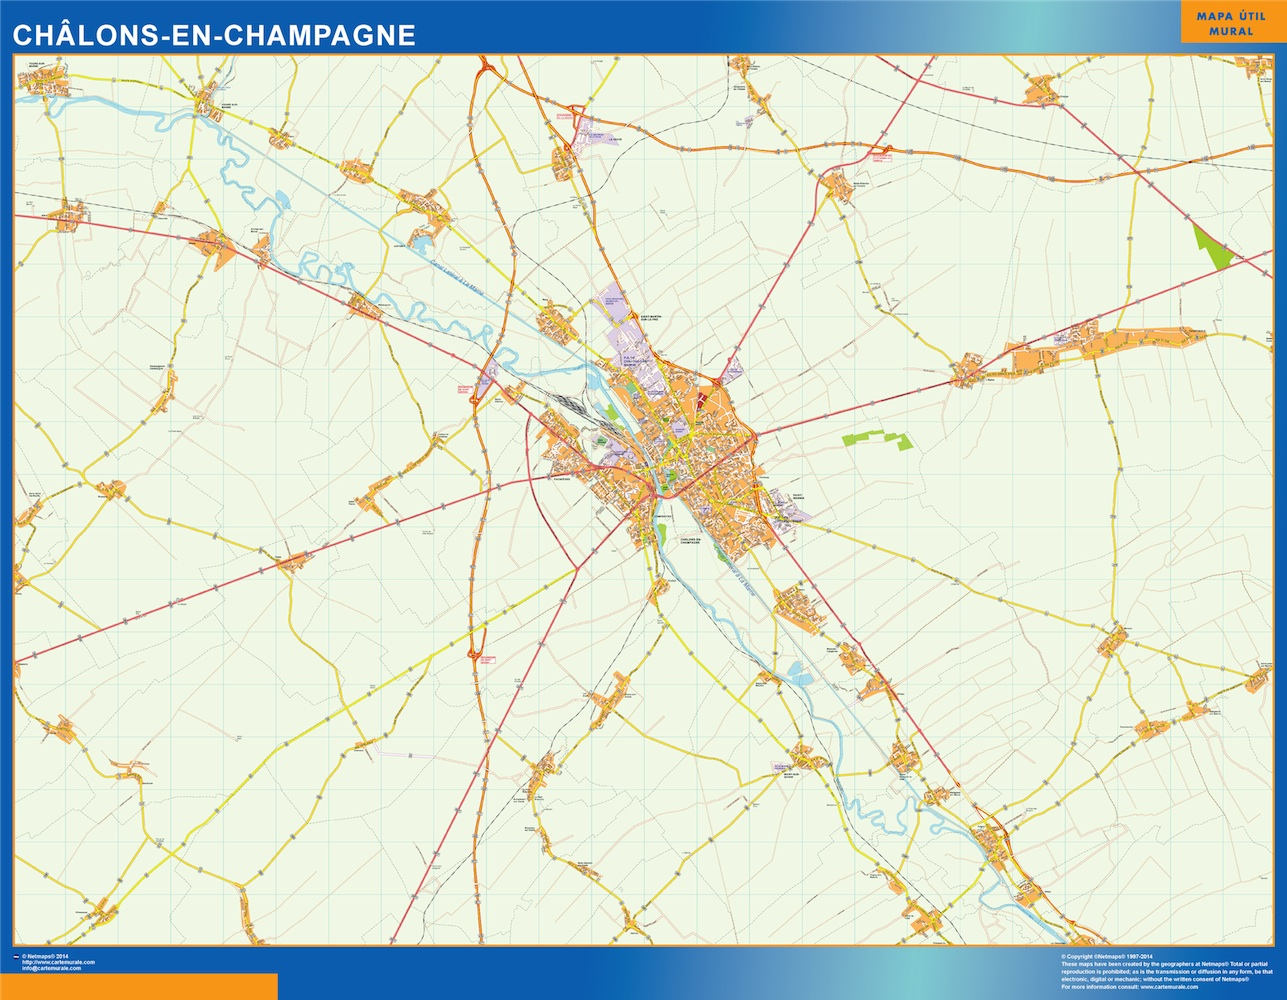 Mapa Chalons En Champagne en Francia plastificado gigante